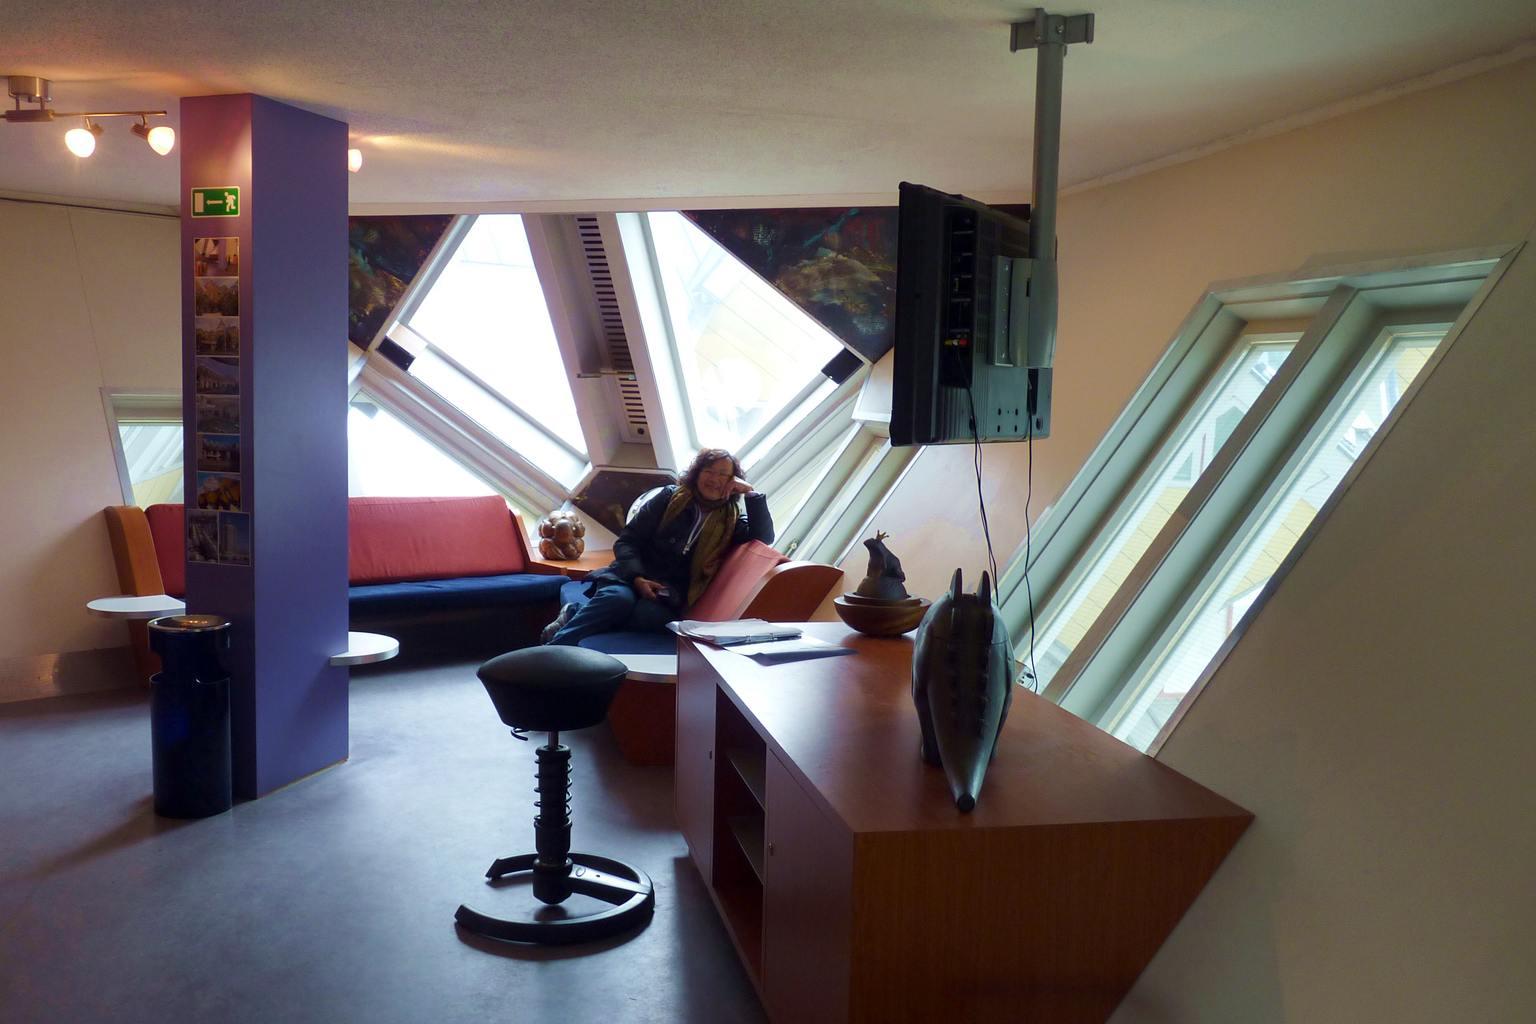 hoteles_mas_raros_del_mundo_107